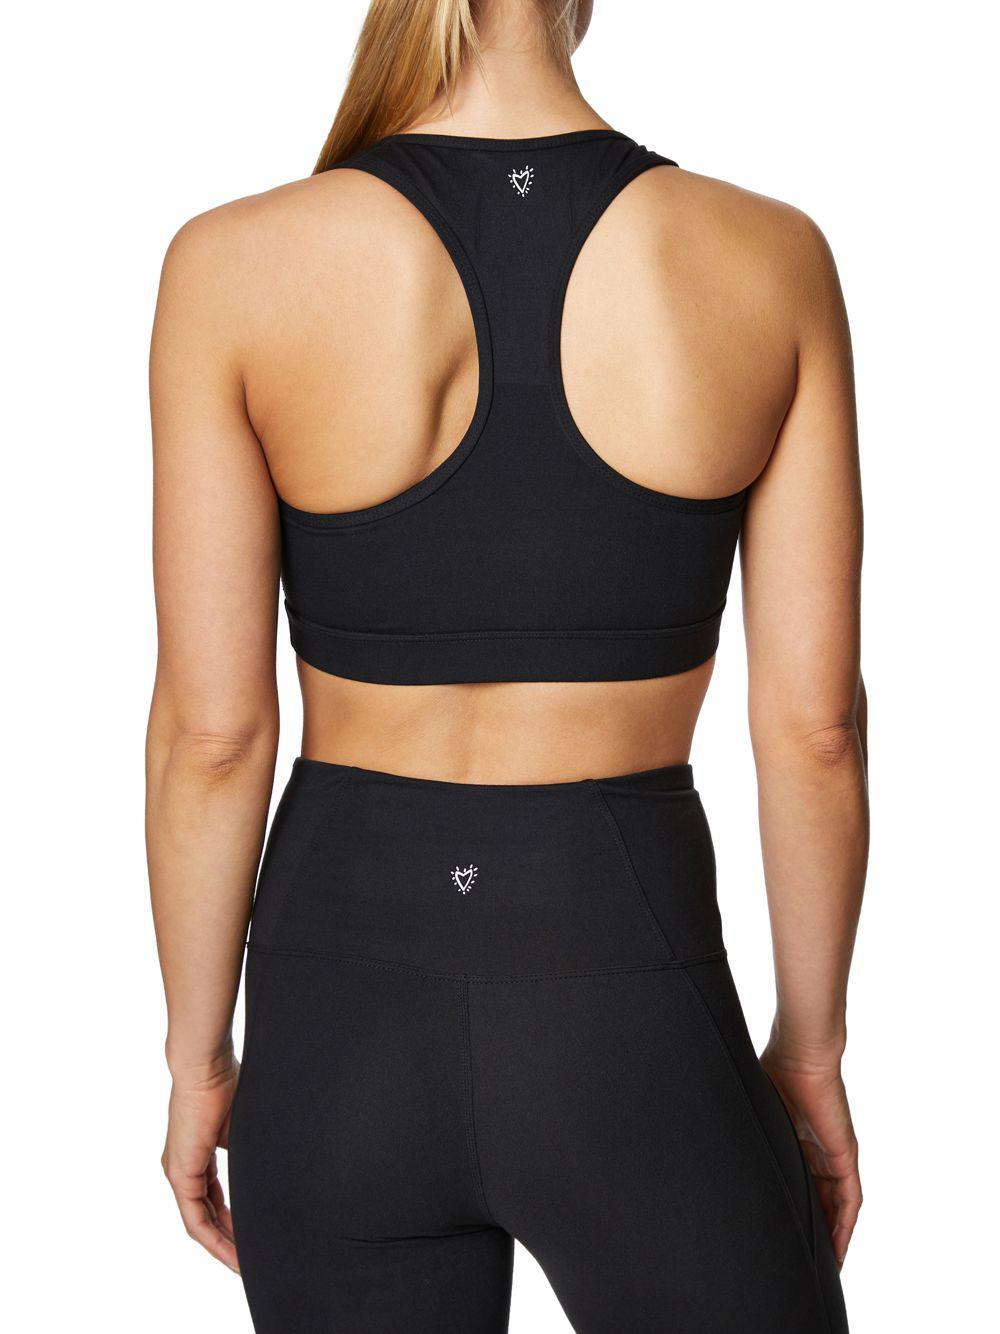 a40de5e26f0d8 Lyst - Betsey Johnson Medium Impact Lace-up Sports Bra in Black